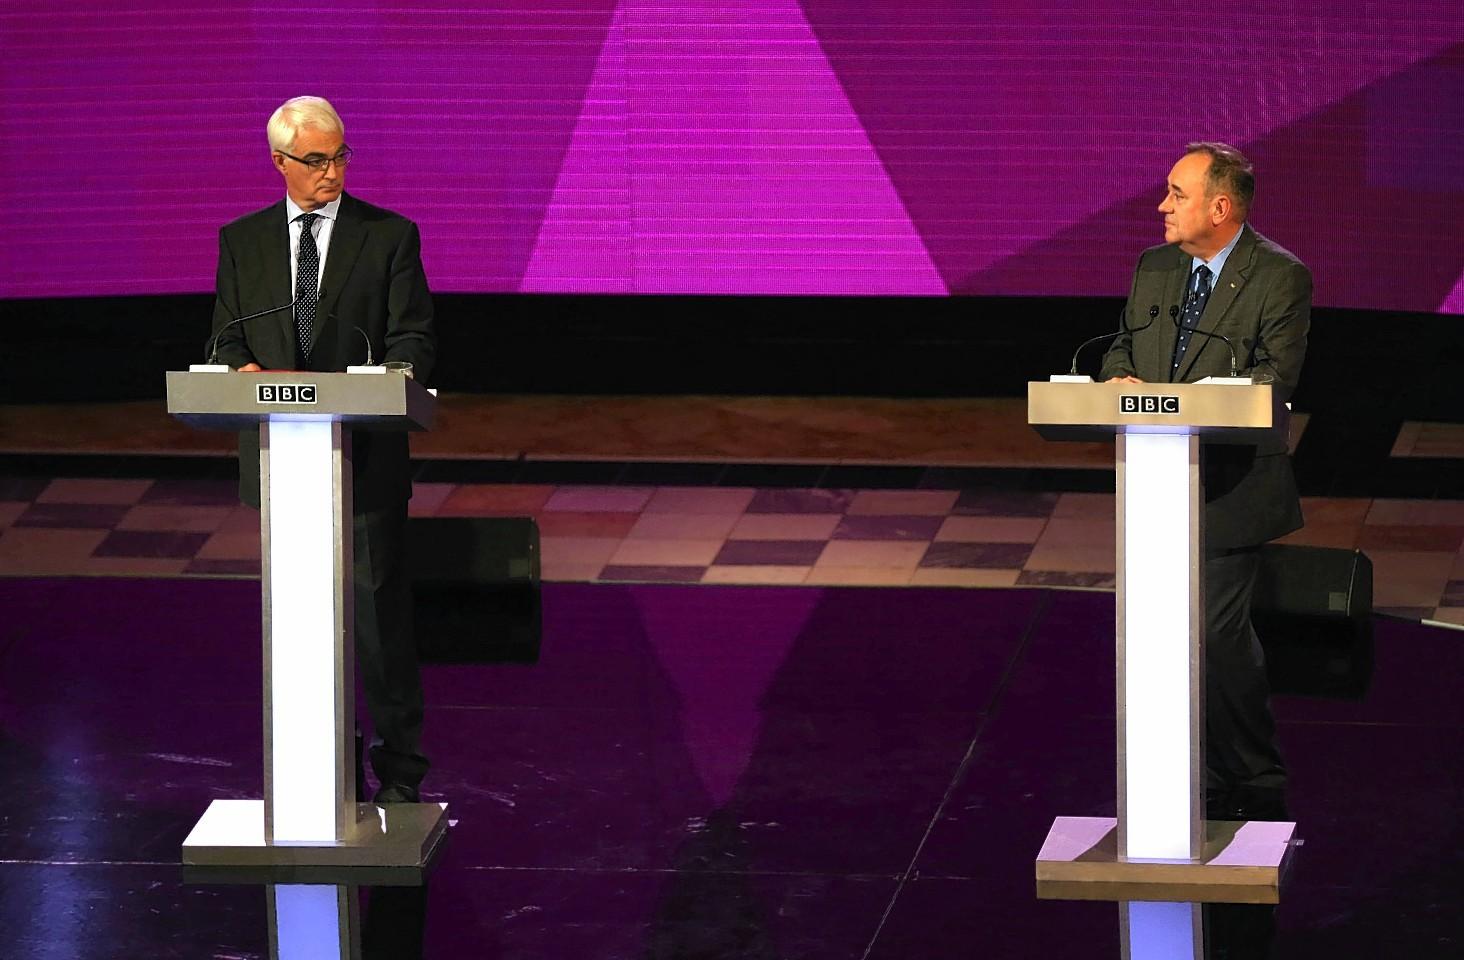 Alex Salmond and Alistair Darling in the second televised indyref debate